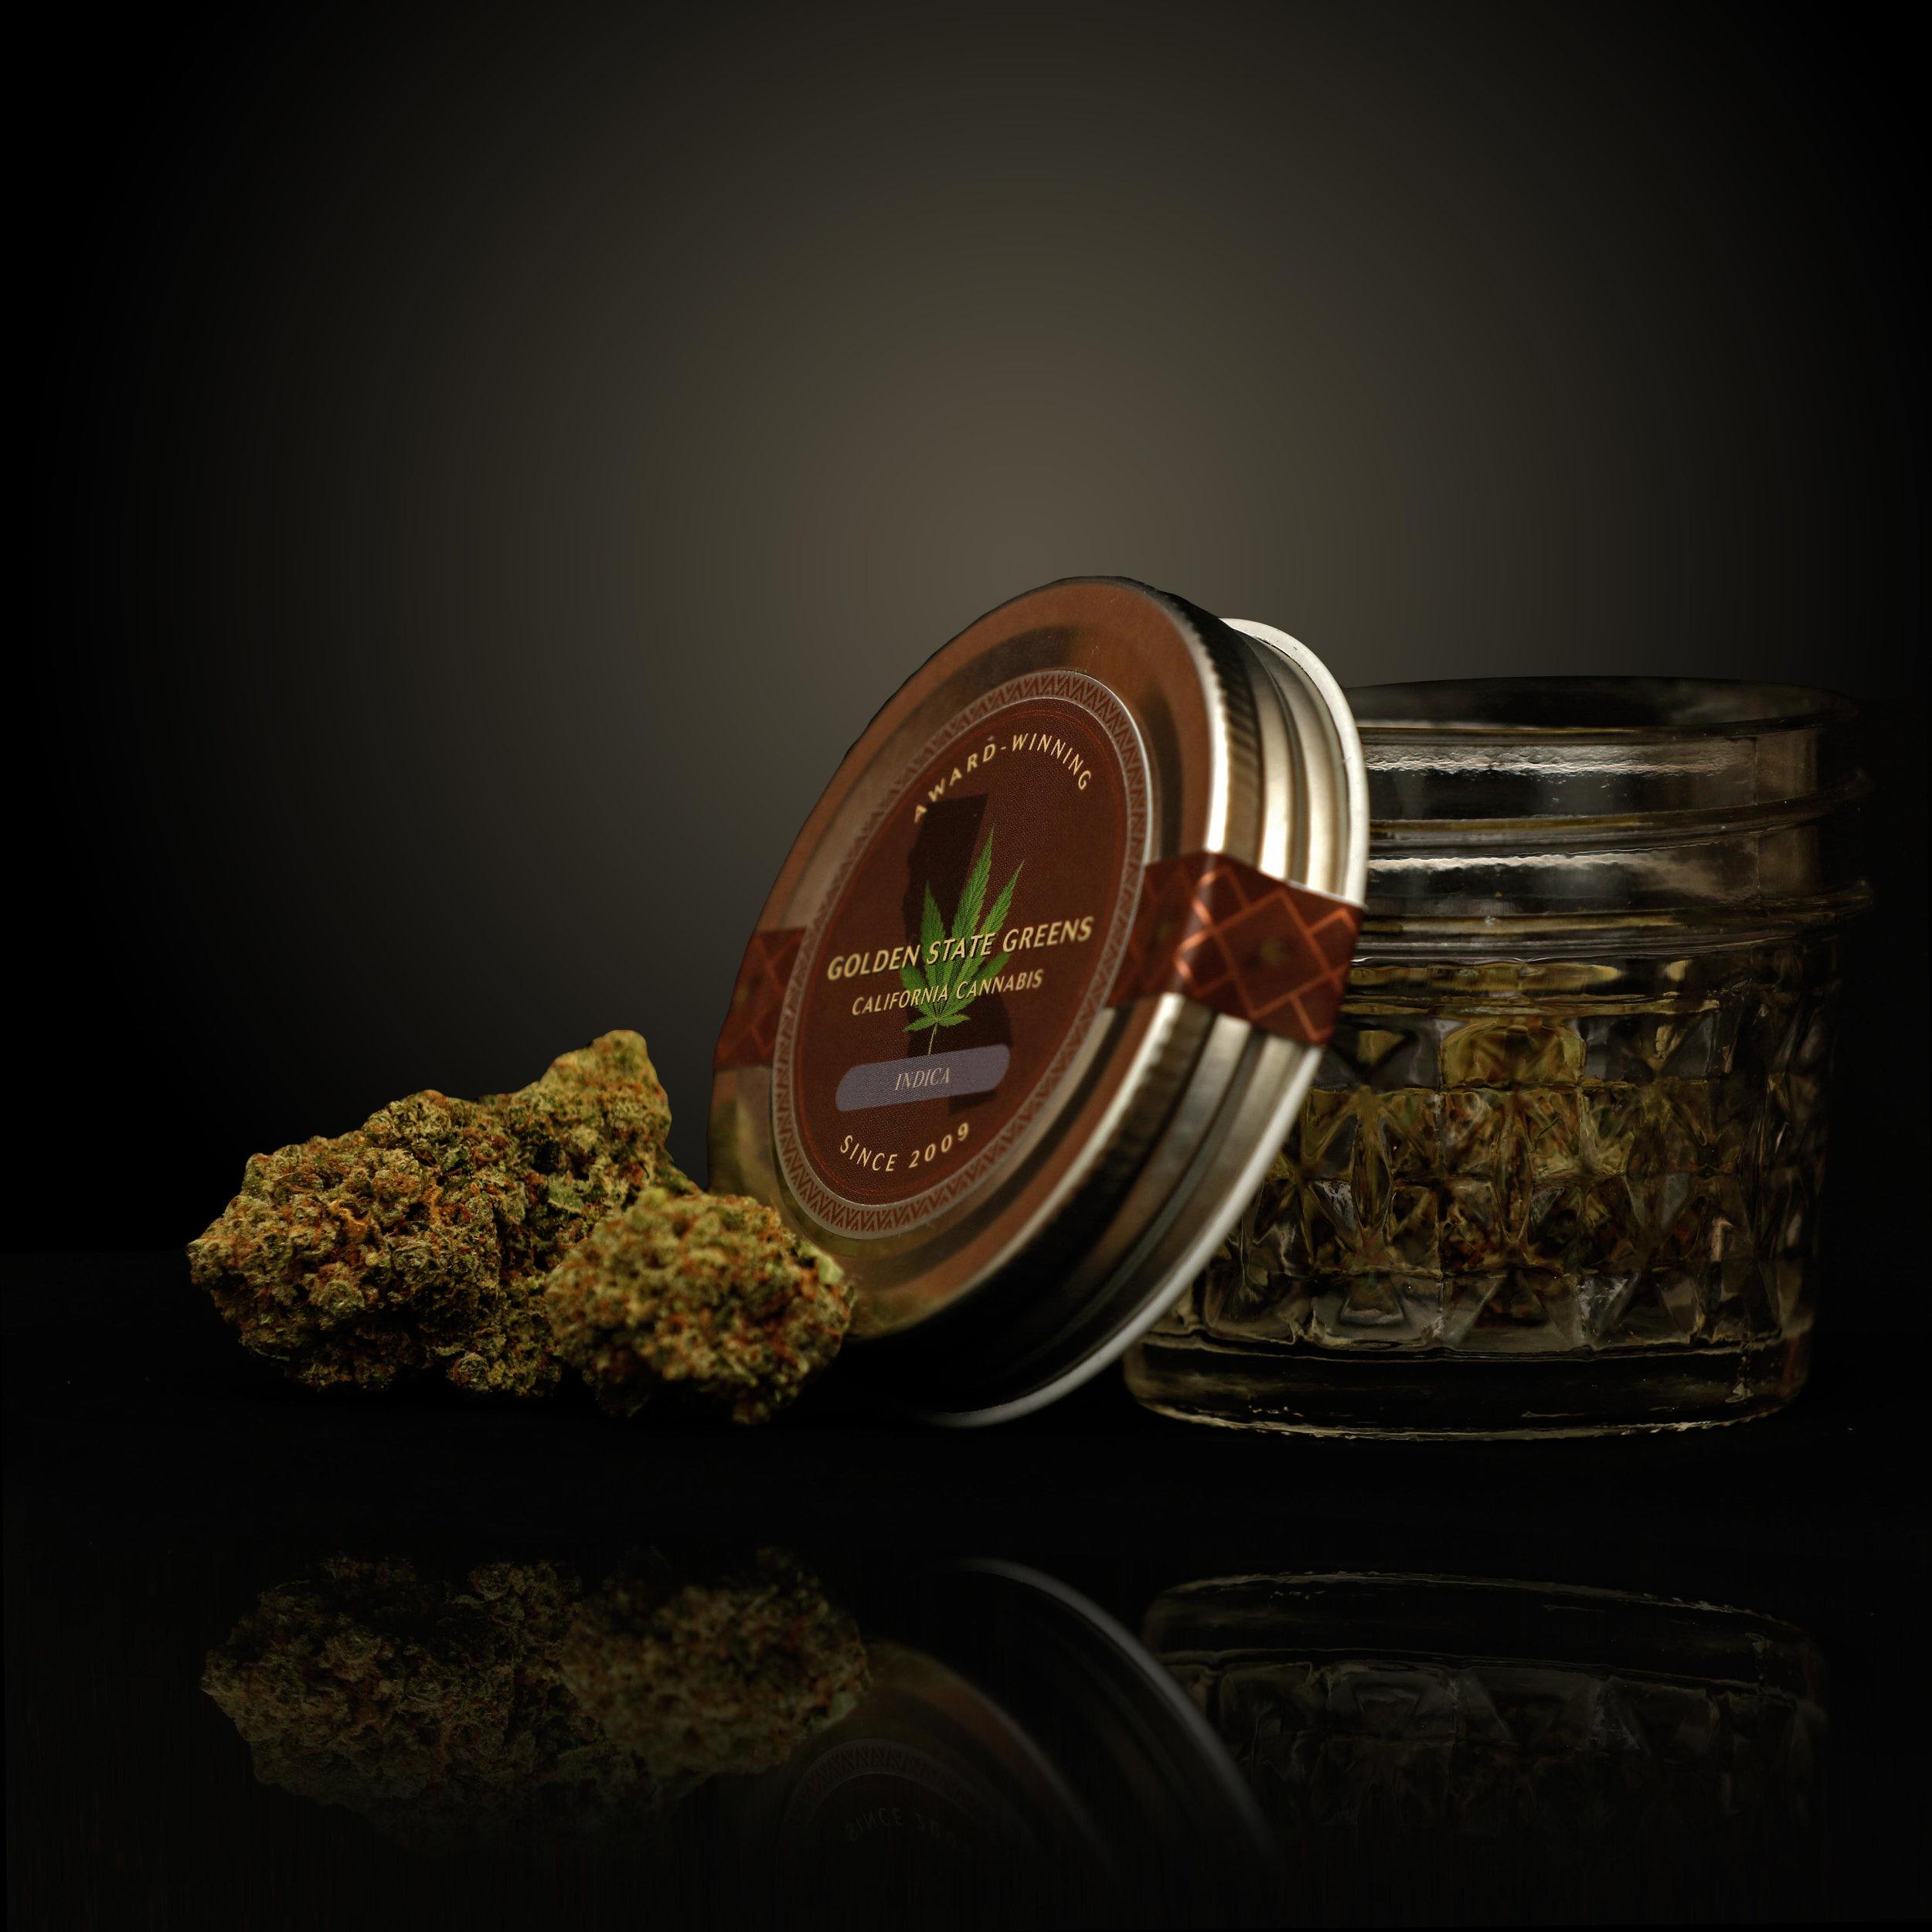 Golden State Greens - Custom Jar